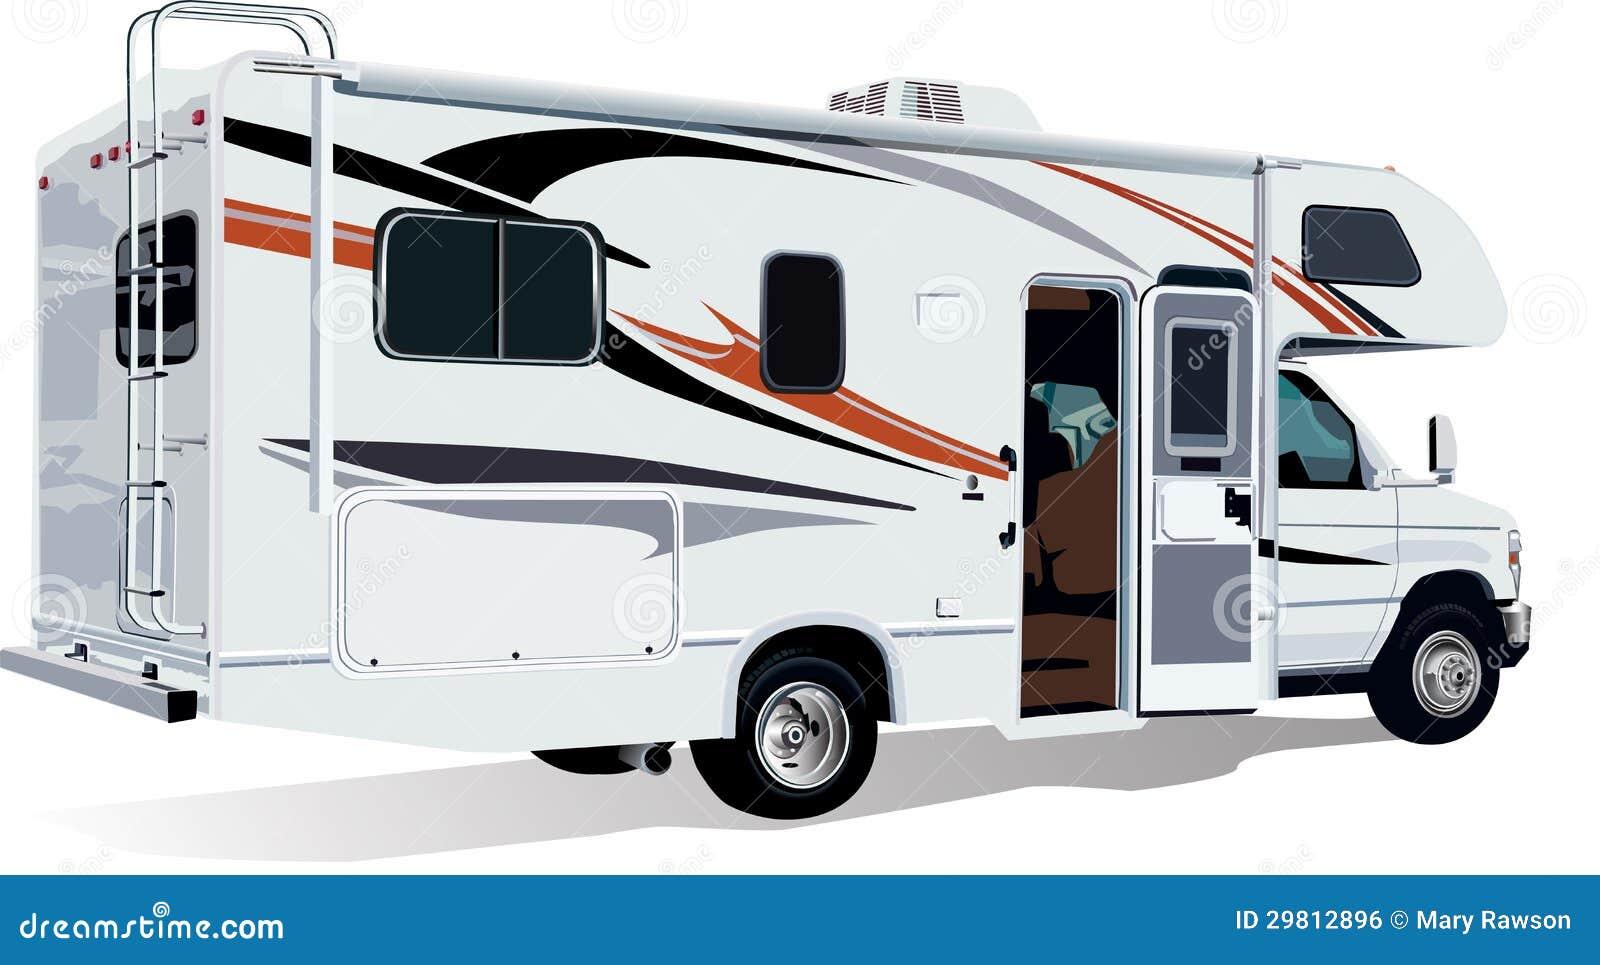 Rv C Class Camper Trailer Stock Photo Image Of Truck